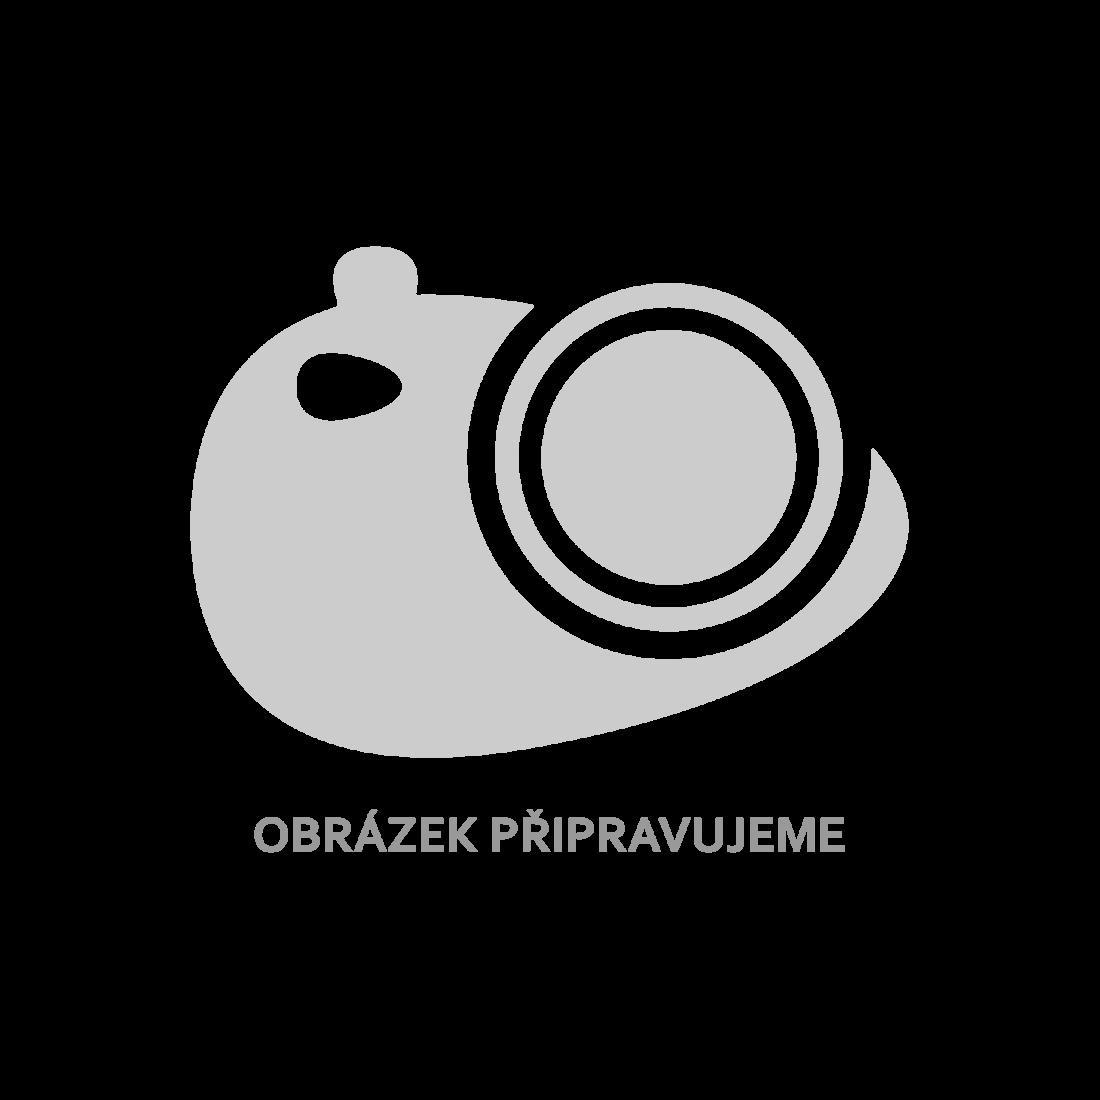 Roleta Zebra / noc a den / Twinroll 120 x 230 cm, kávová